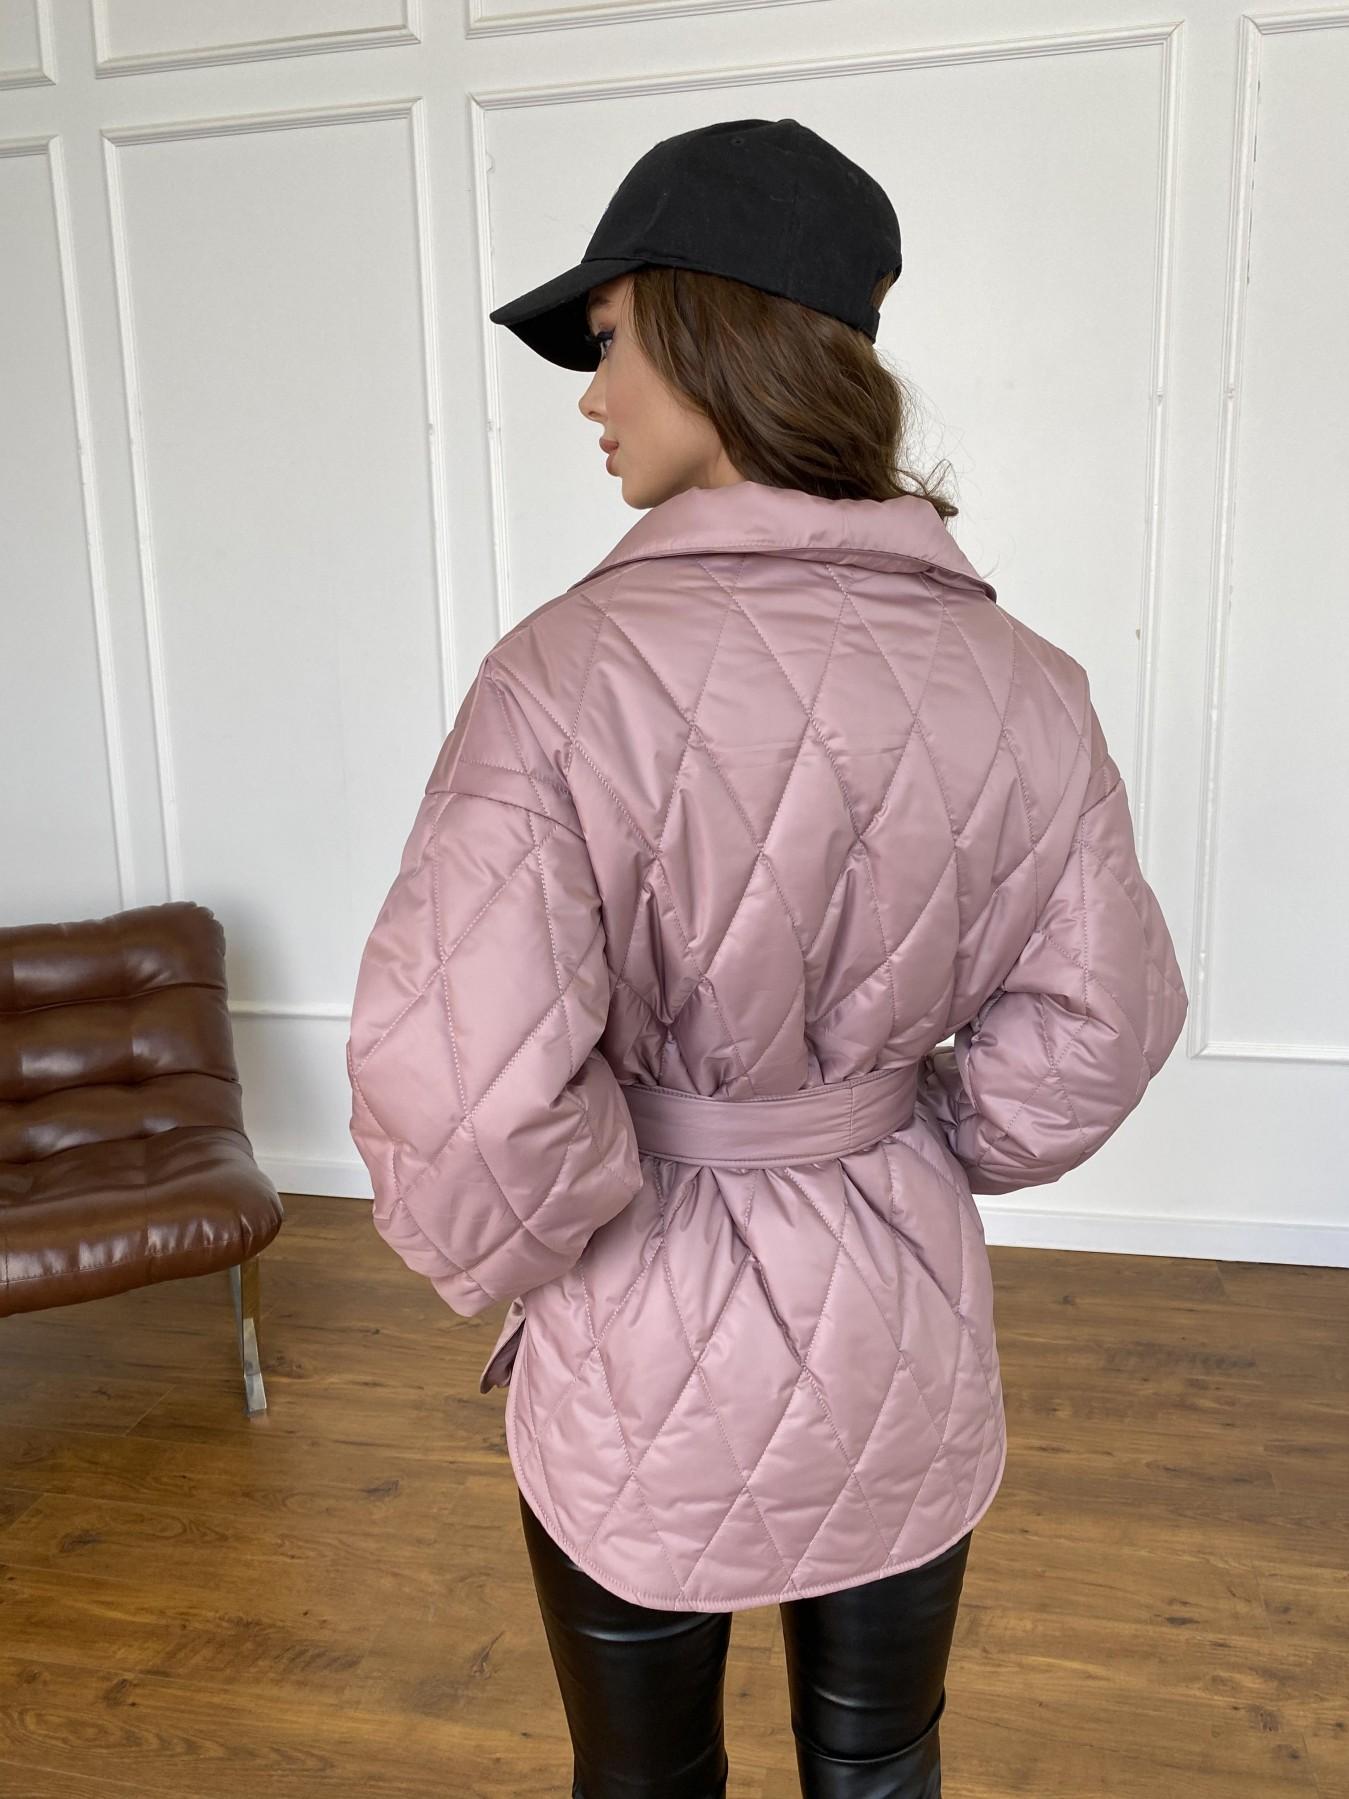 Моно  куртка из плащевой ткани Gloria 11081 АРТ. 47647 Цвет: Пудра - фото 7, интернет магазин tm-modus.ru